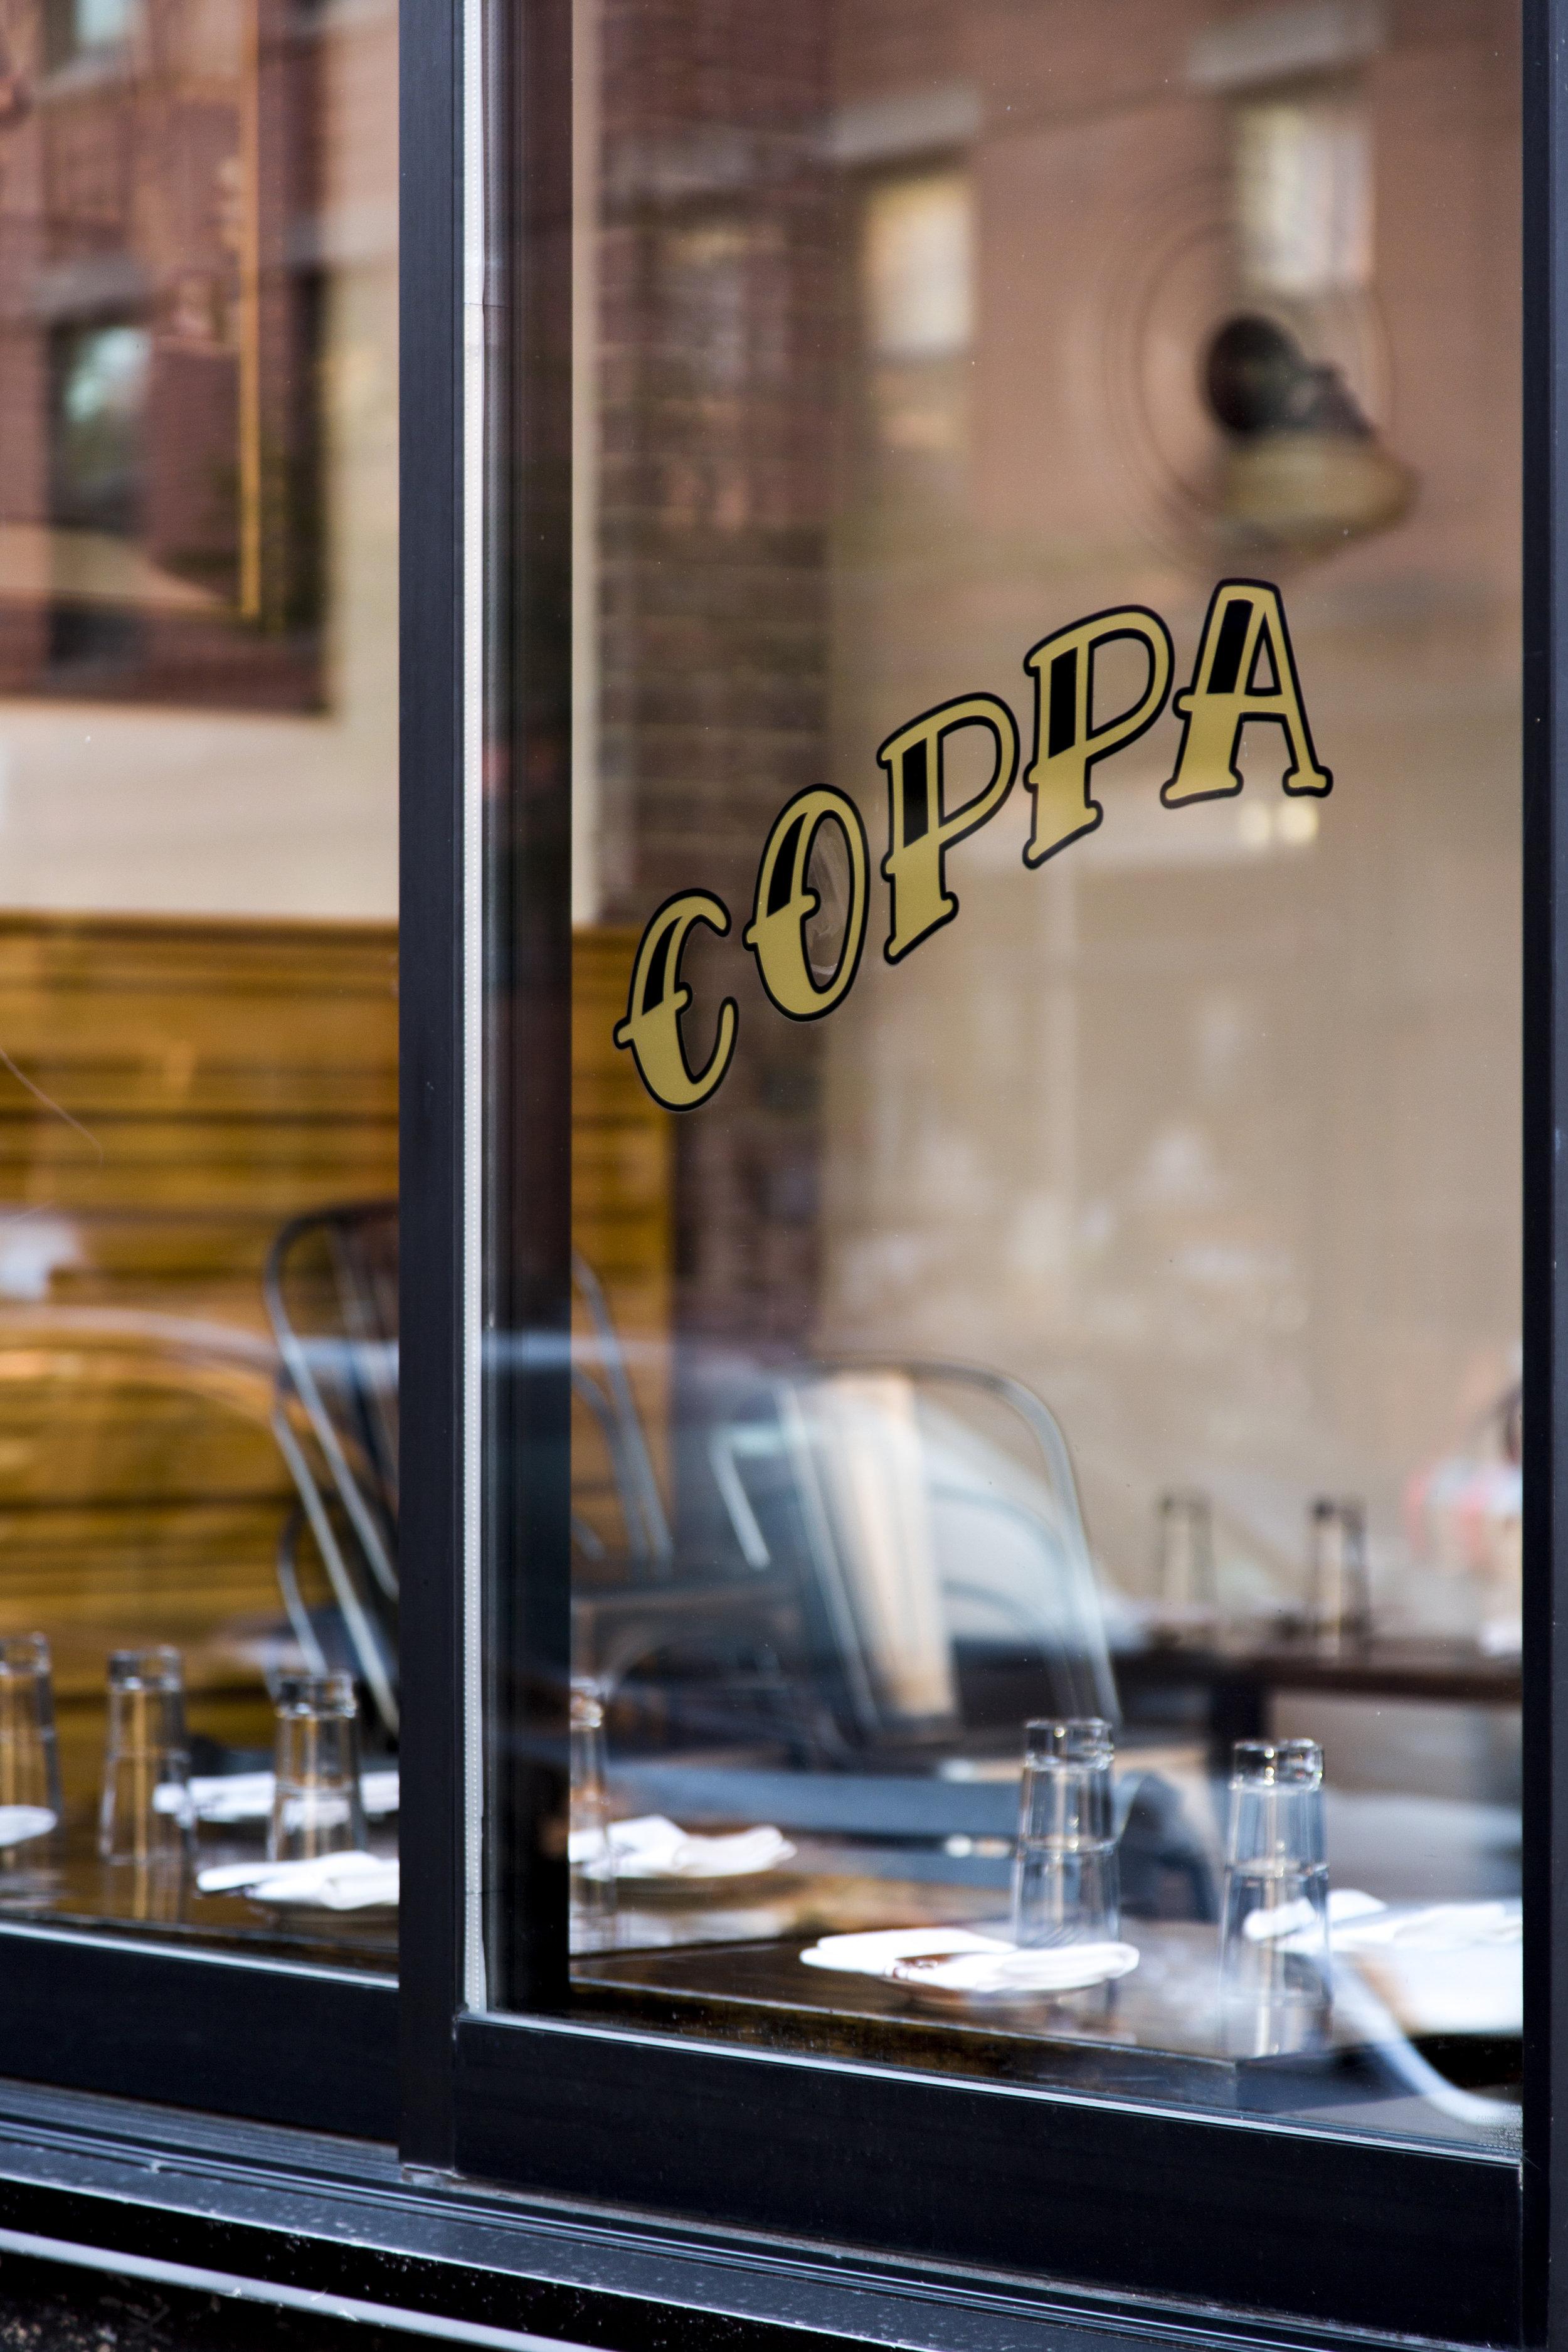 Coppa: A Neighborhood Enoteca